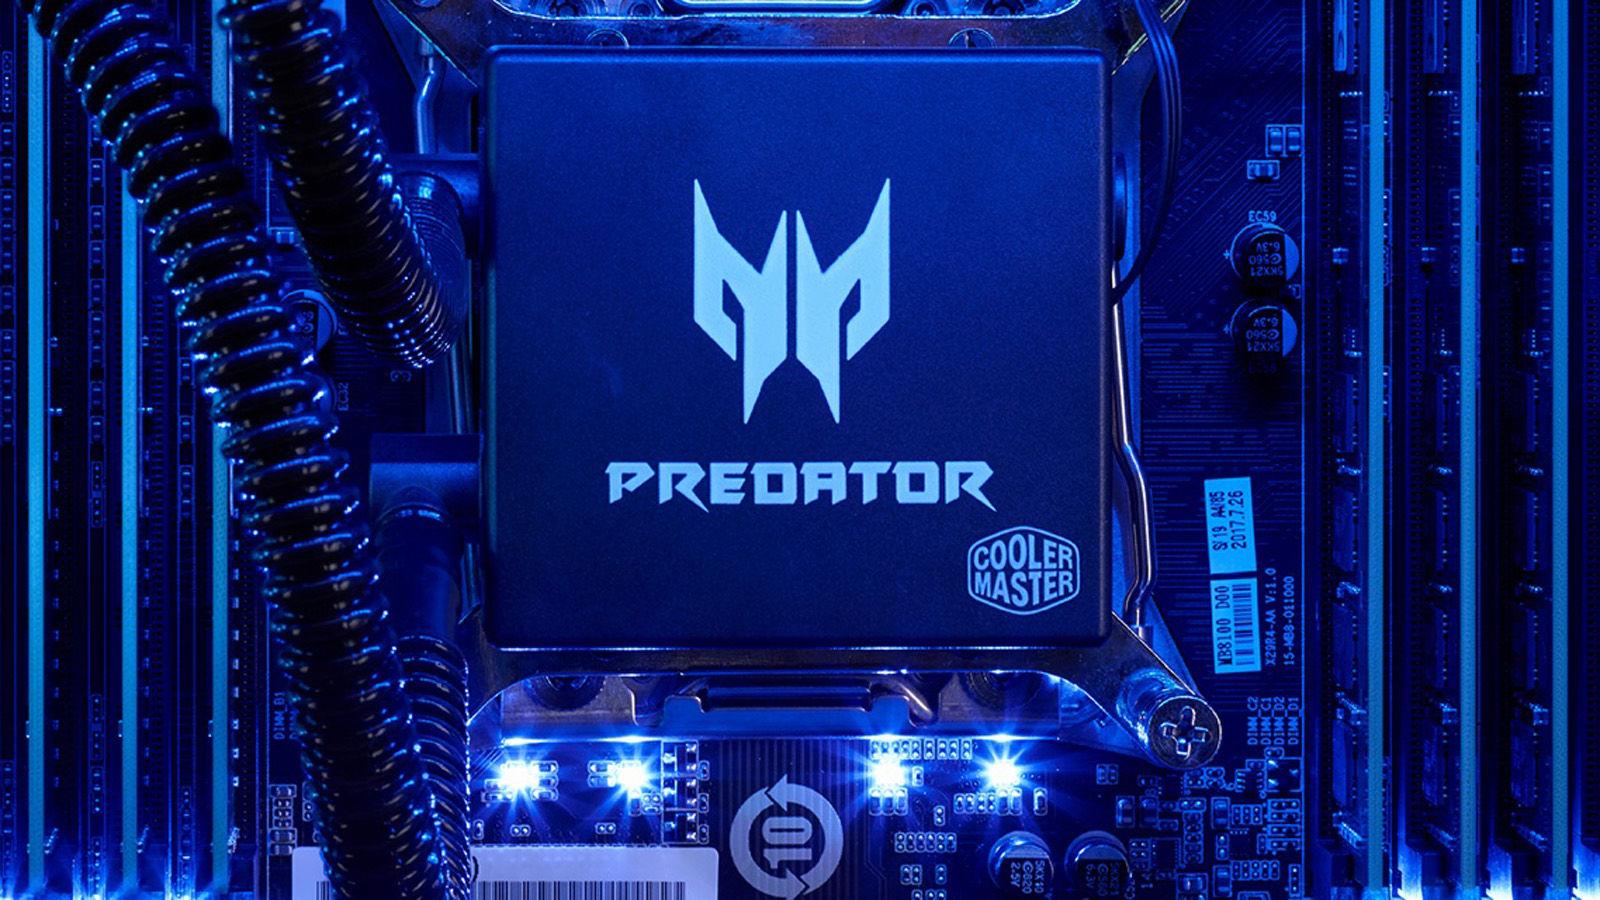 Acer Predator Orion 9000 Po9 600 Inside - 1600x900 ...